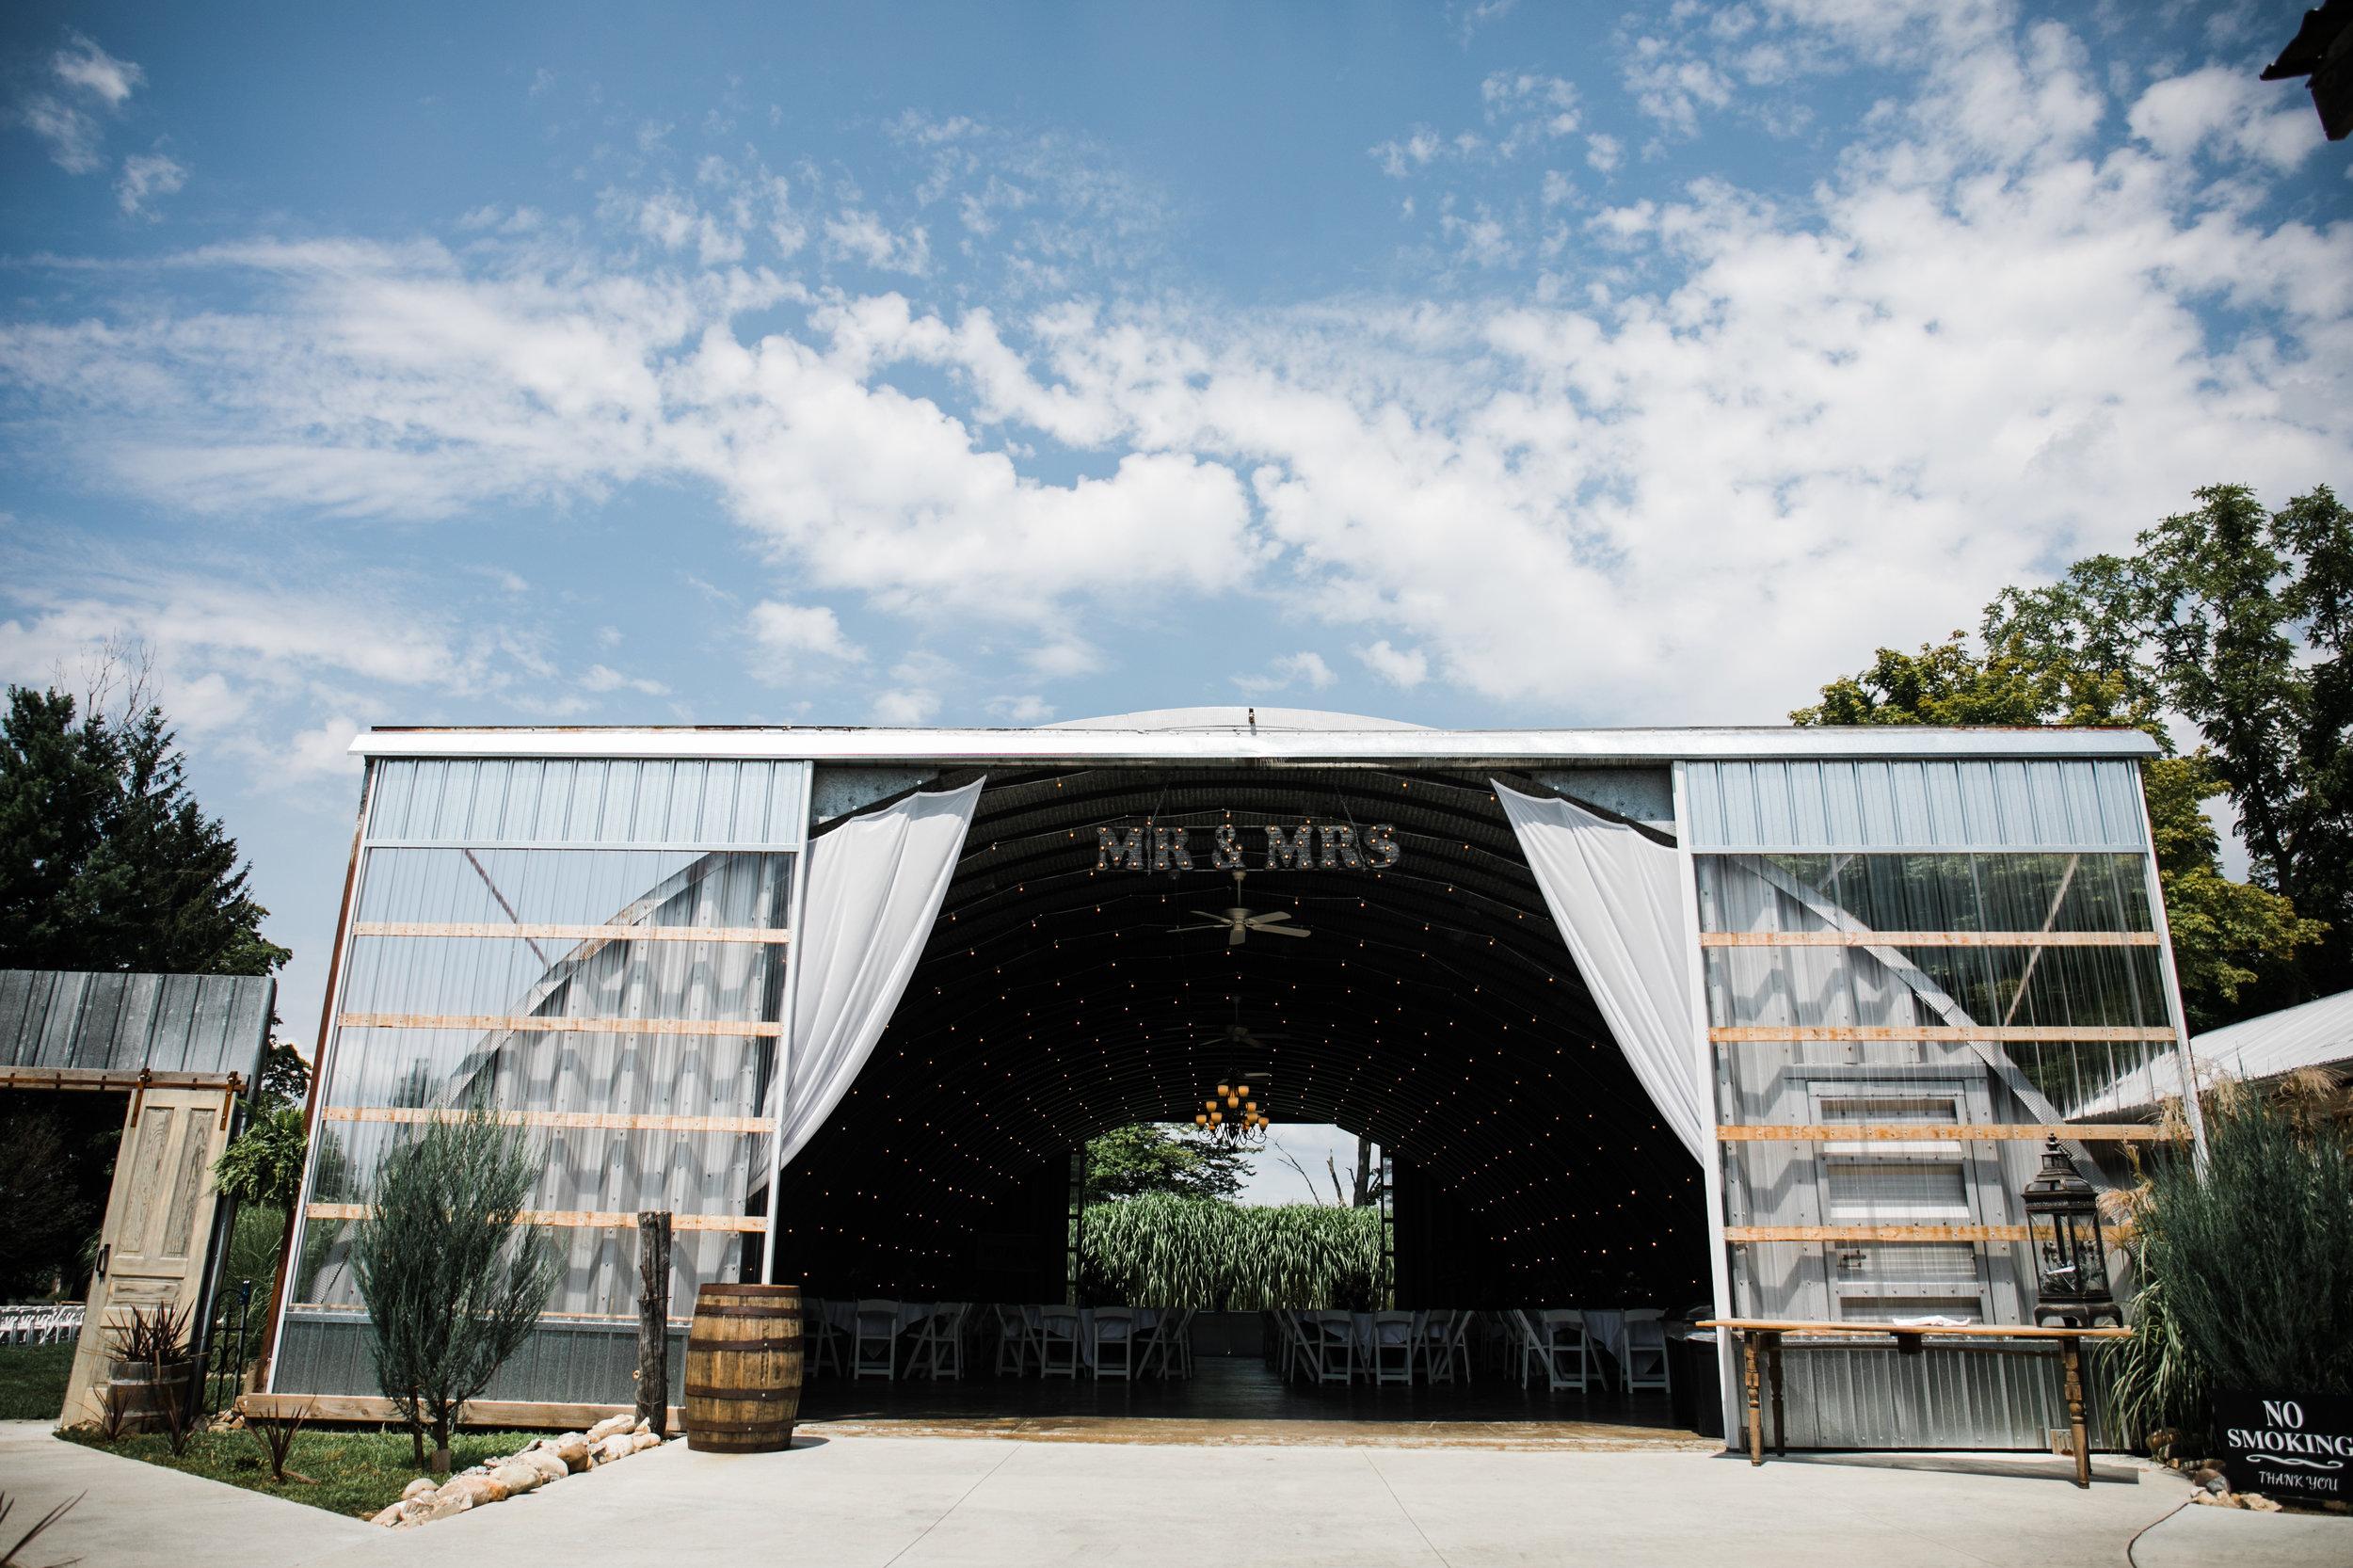 Res Les Farms East Leroy Michigan | Wedding Venue